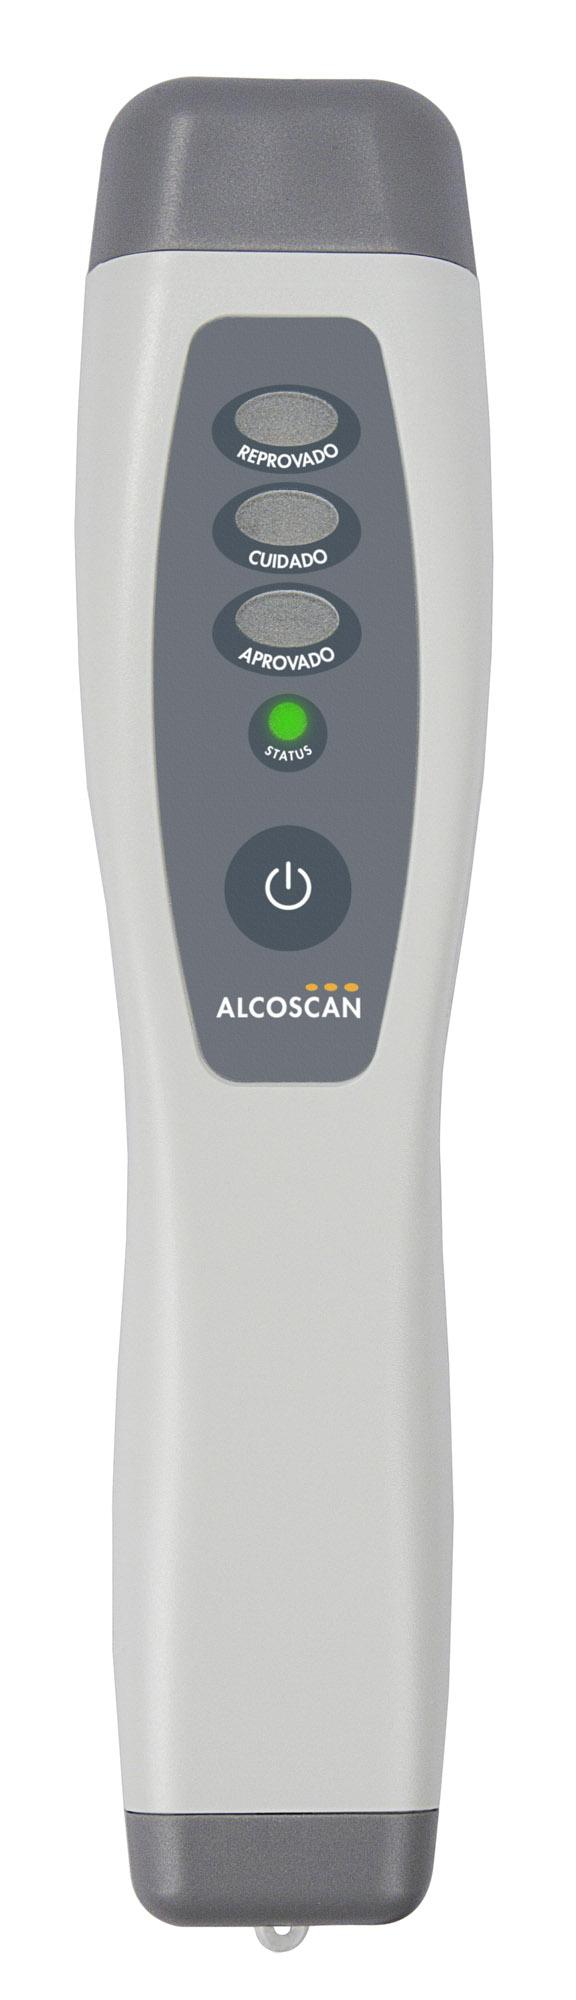 Alcoscan 2